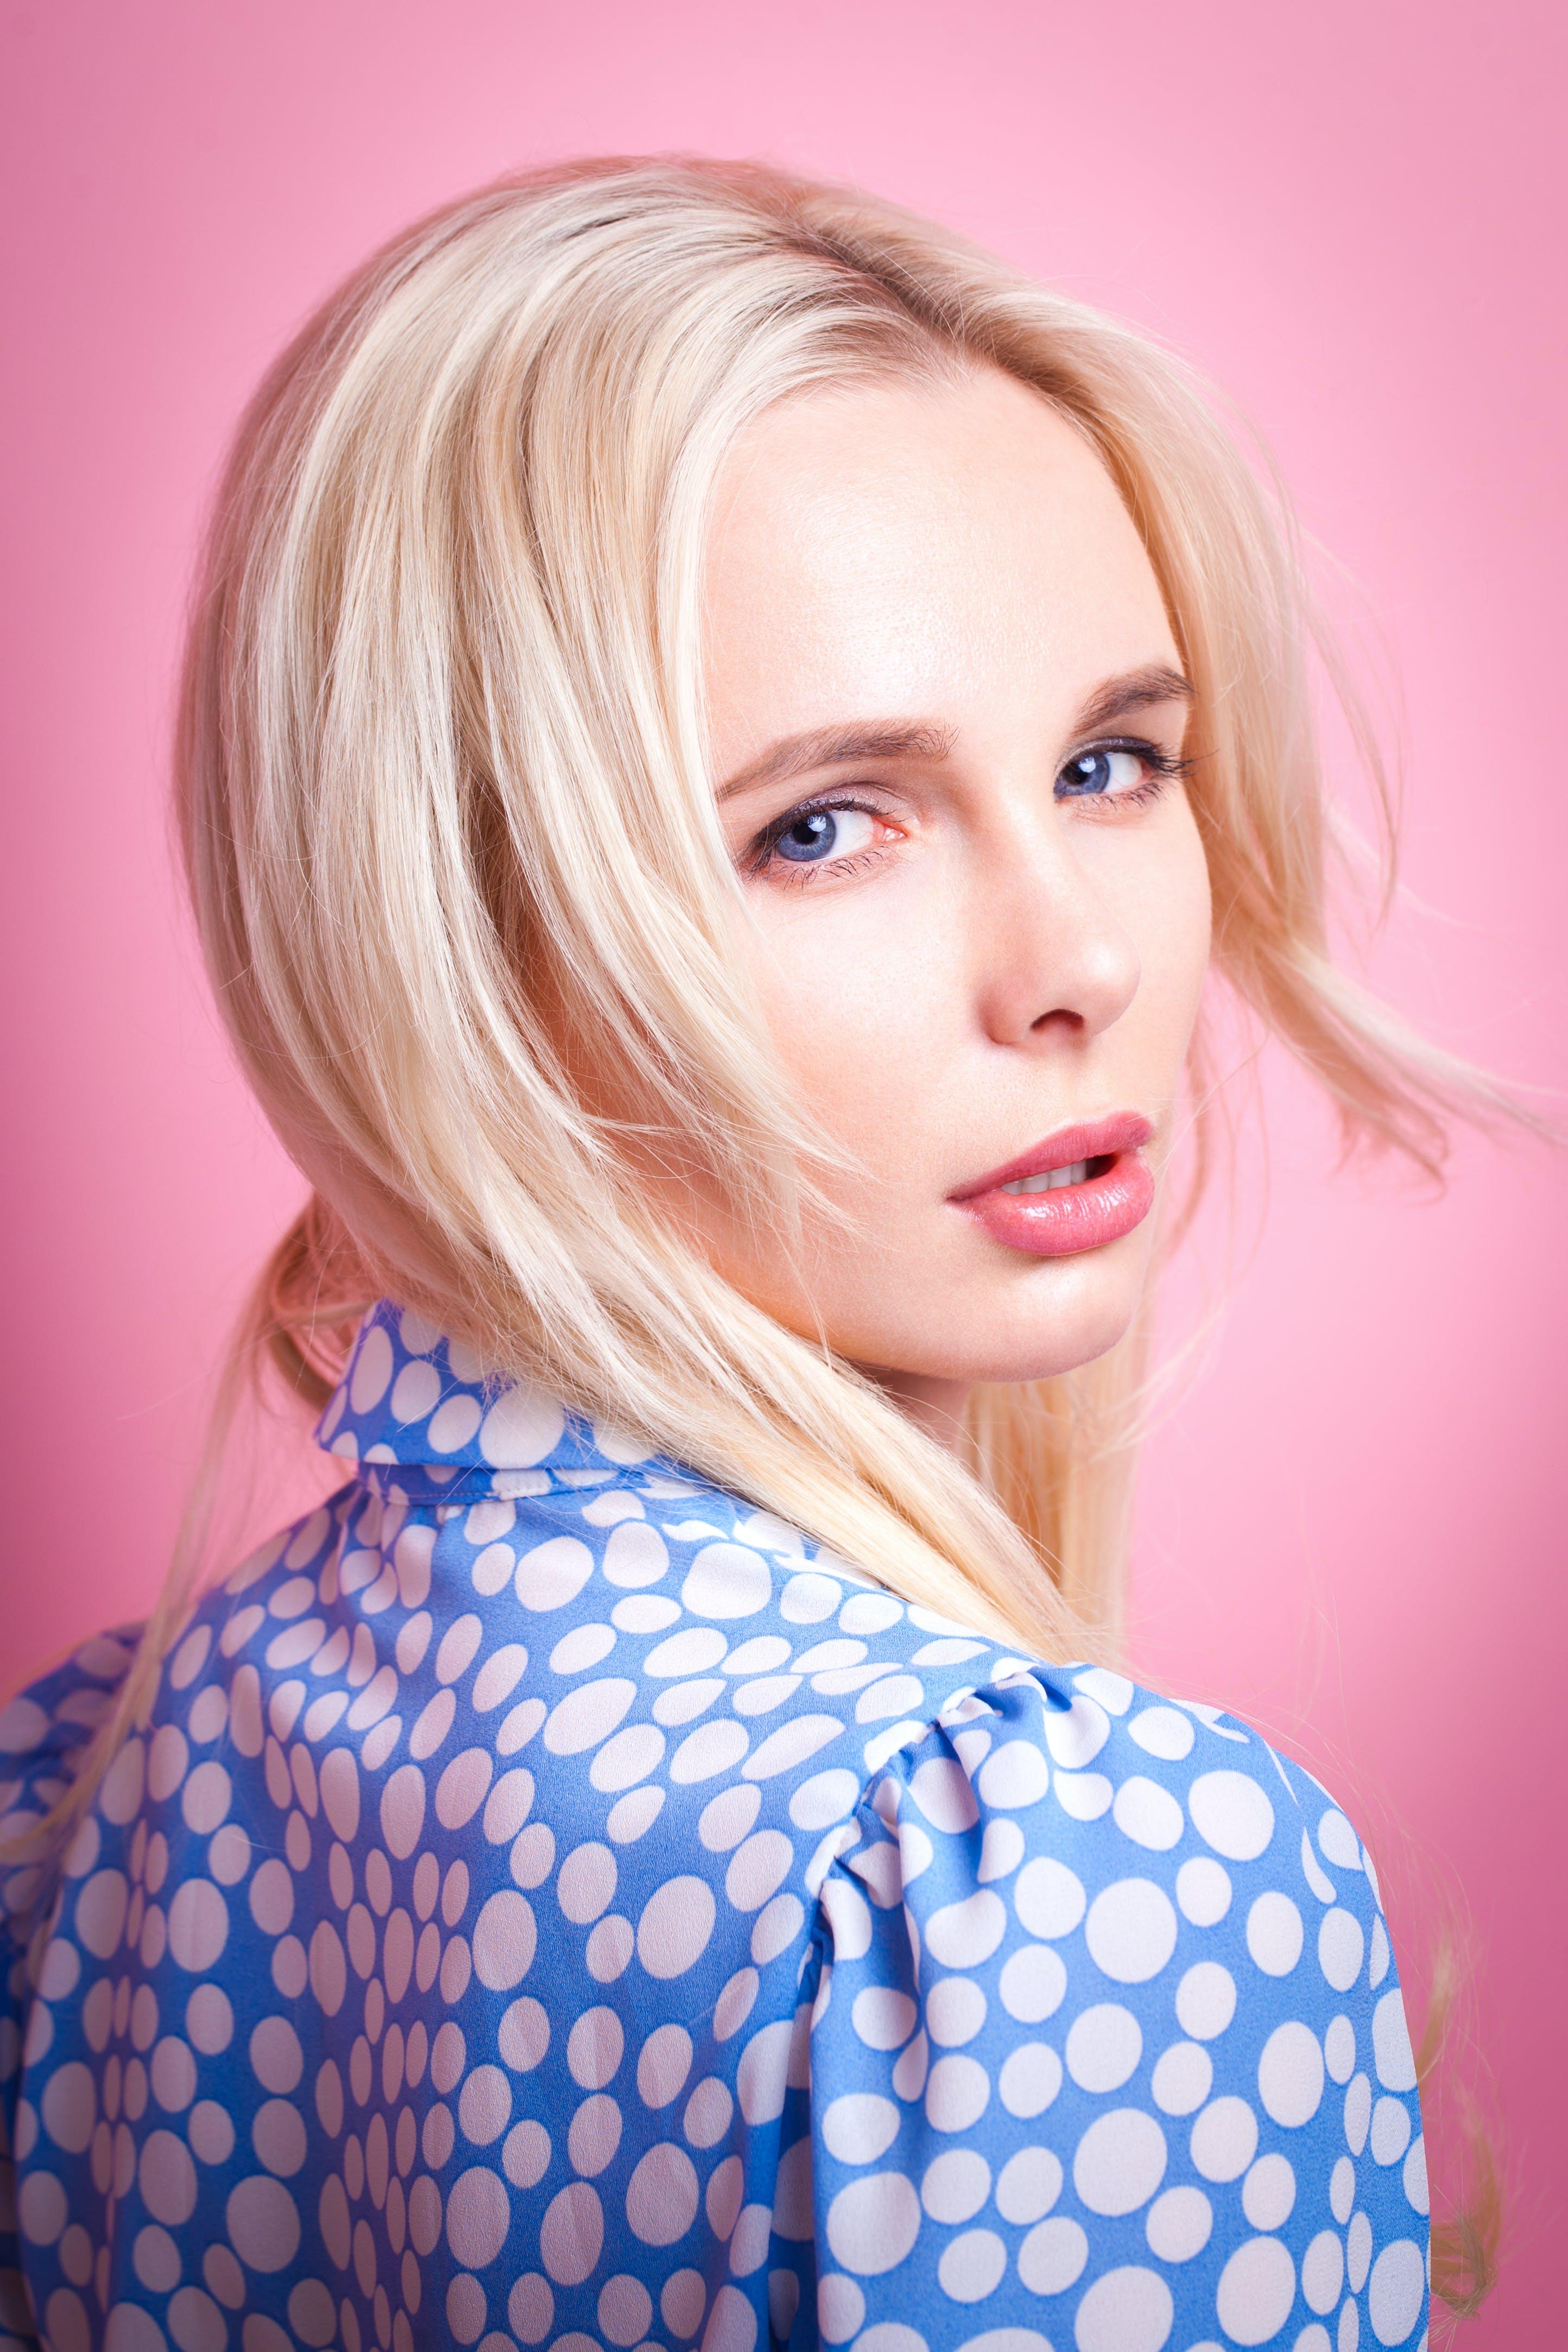 Free stock photo of Ольга Вельская Москва